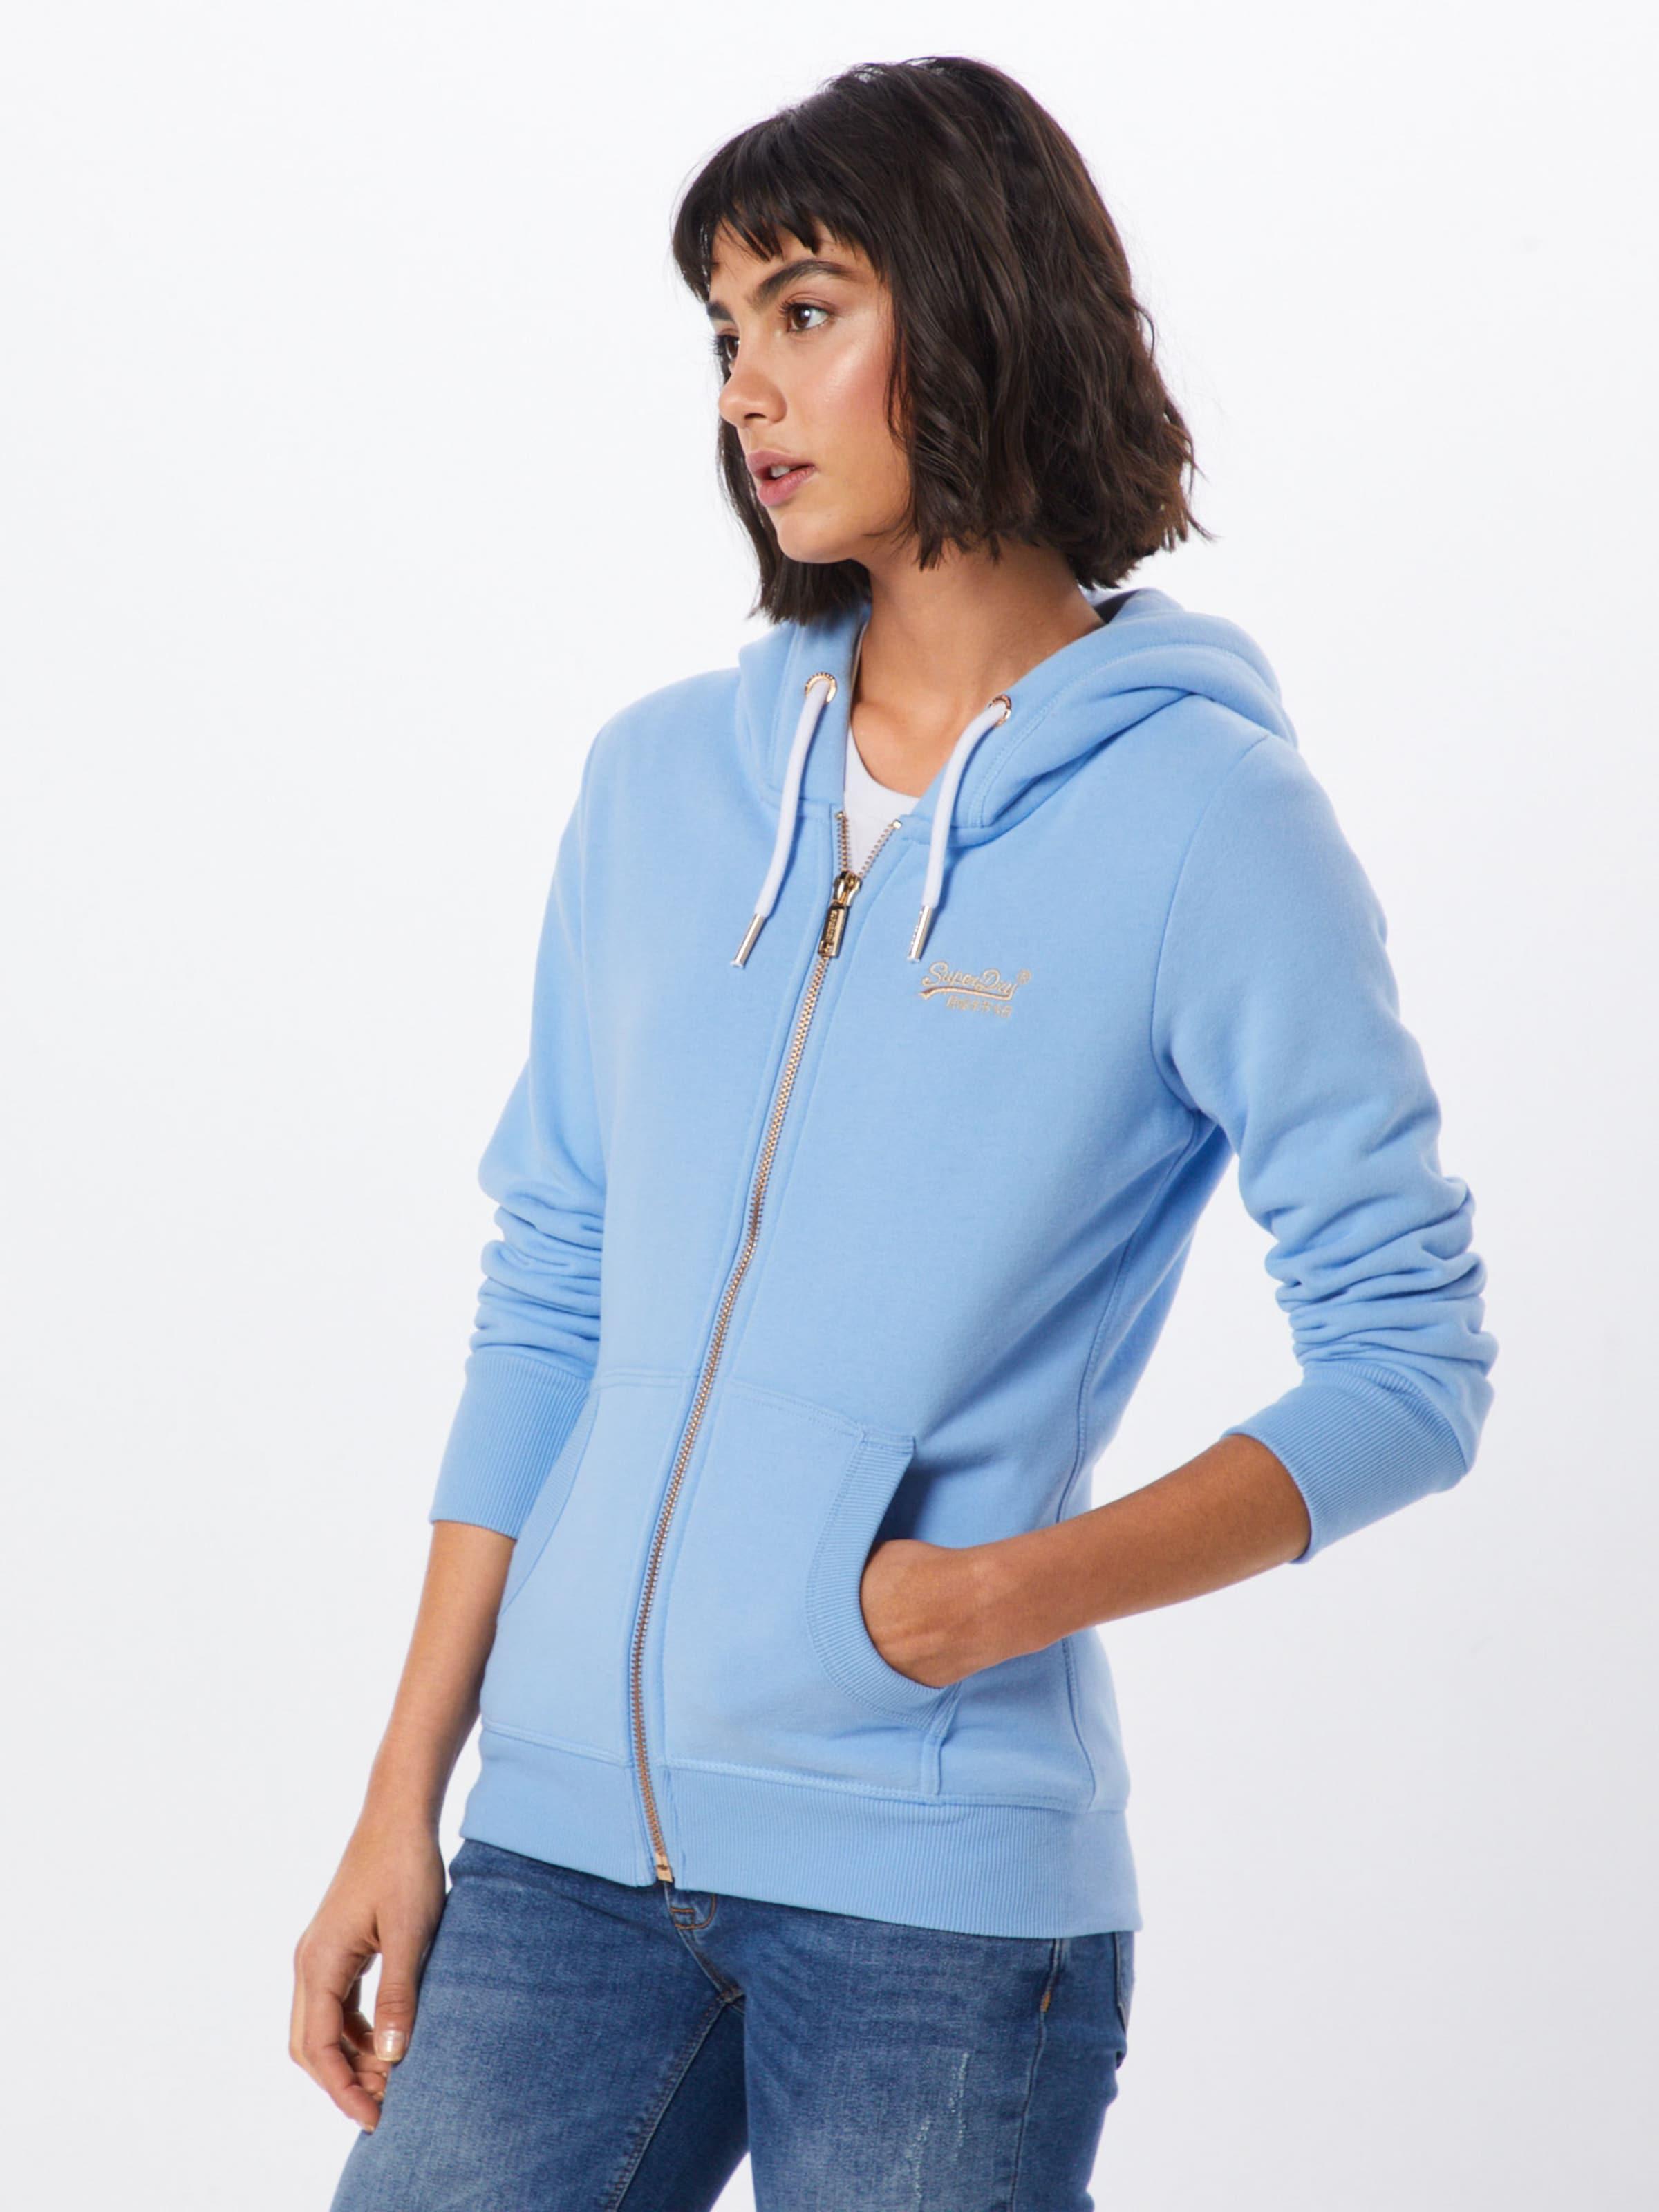 Superdry Ziphood' Clair 'orange Label De Veste Elite En Bleu Survêtement 0wPknX8O